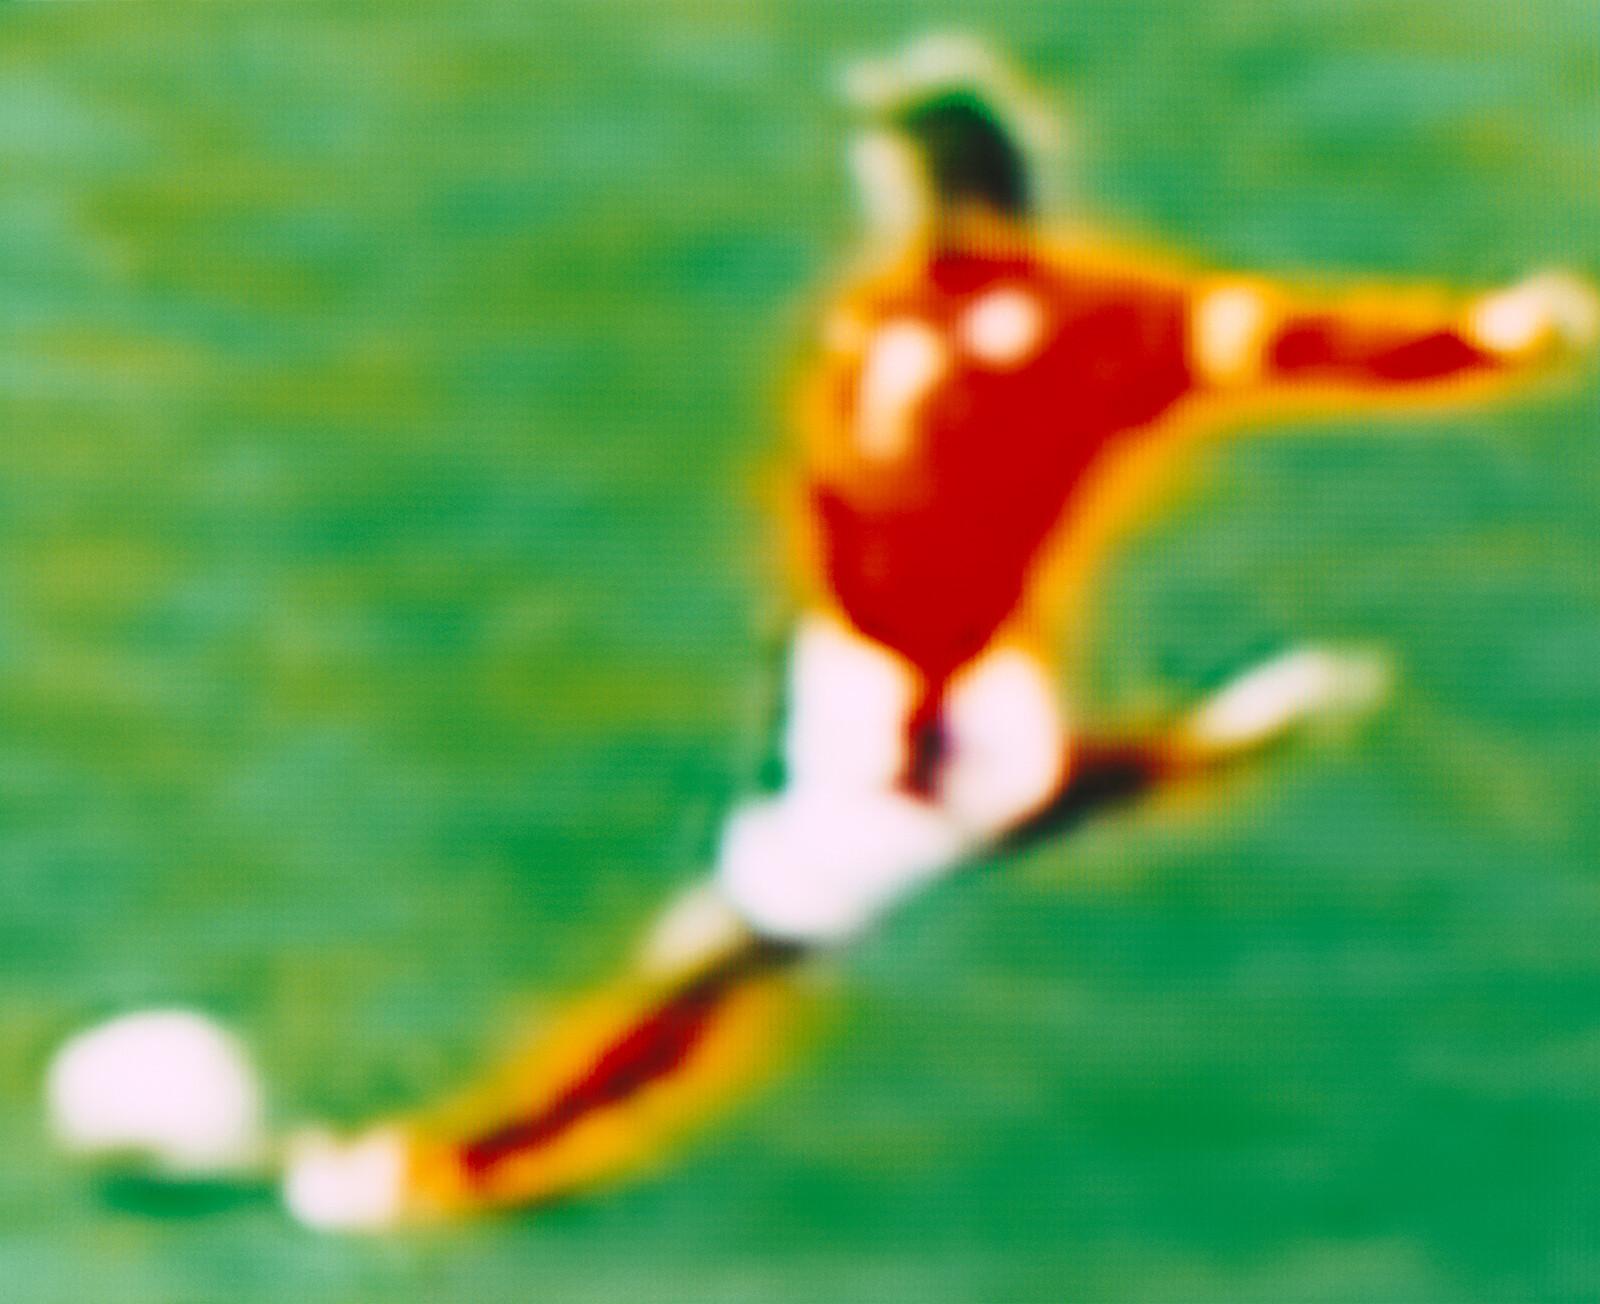 David Beckham England v Nigeria 0 - 0 (Group stage) 12.06.2002, Nagai Stadium, Osaka, Japan - Robert Davies